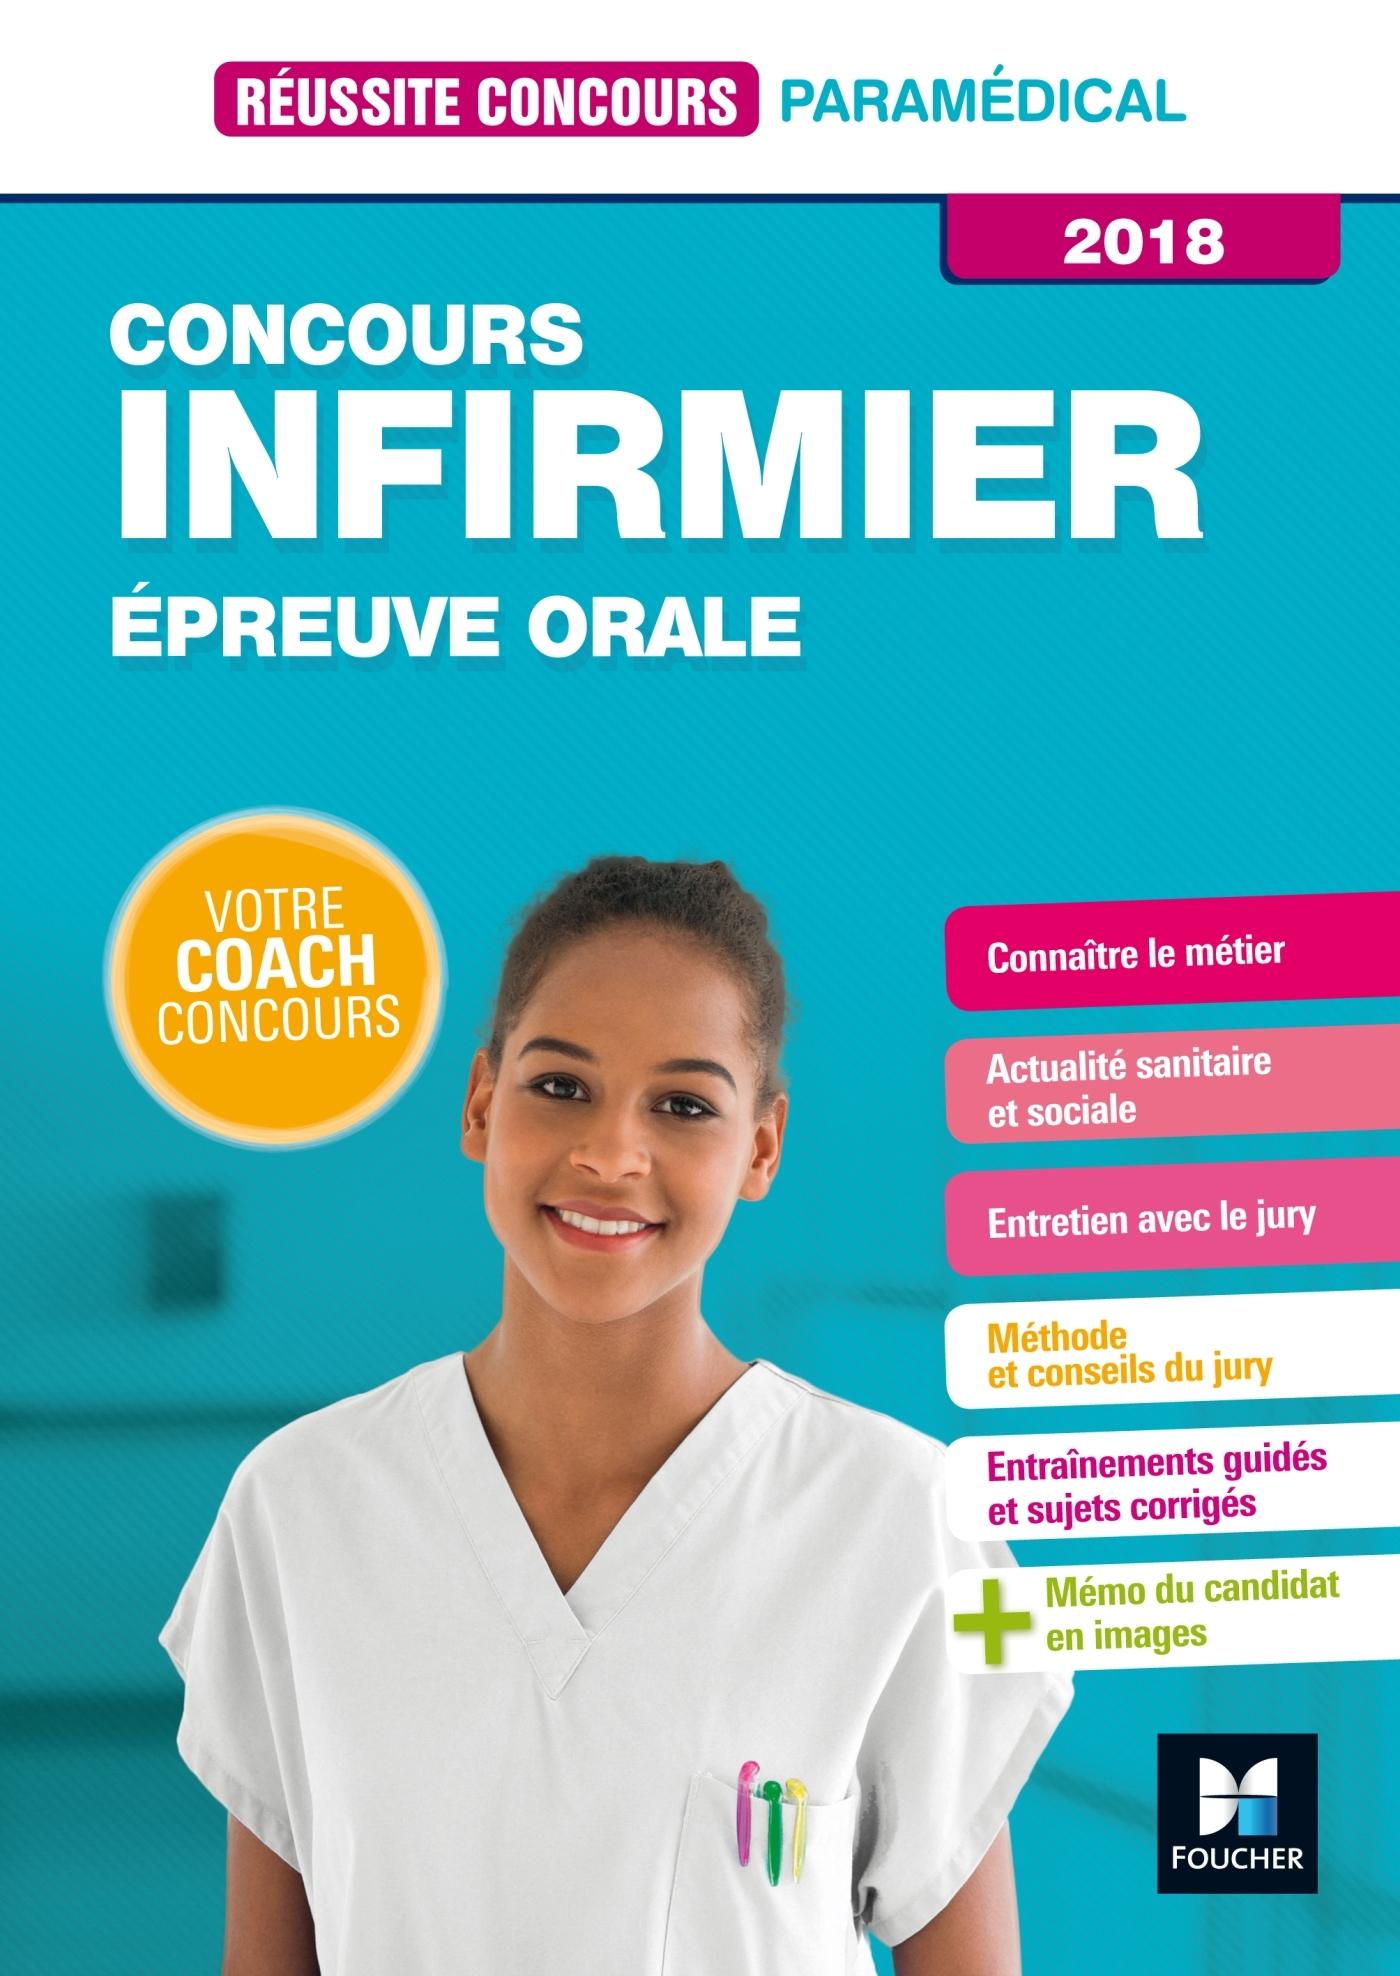 REUSSITE CONCOURS - IFSI - EPREUVE ORALE - 2018 - PREPARATION COMPLETE